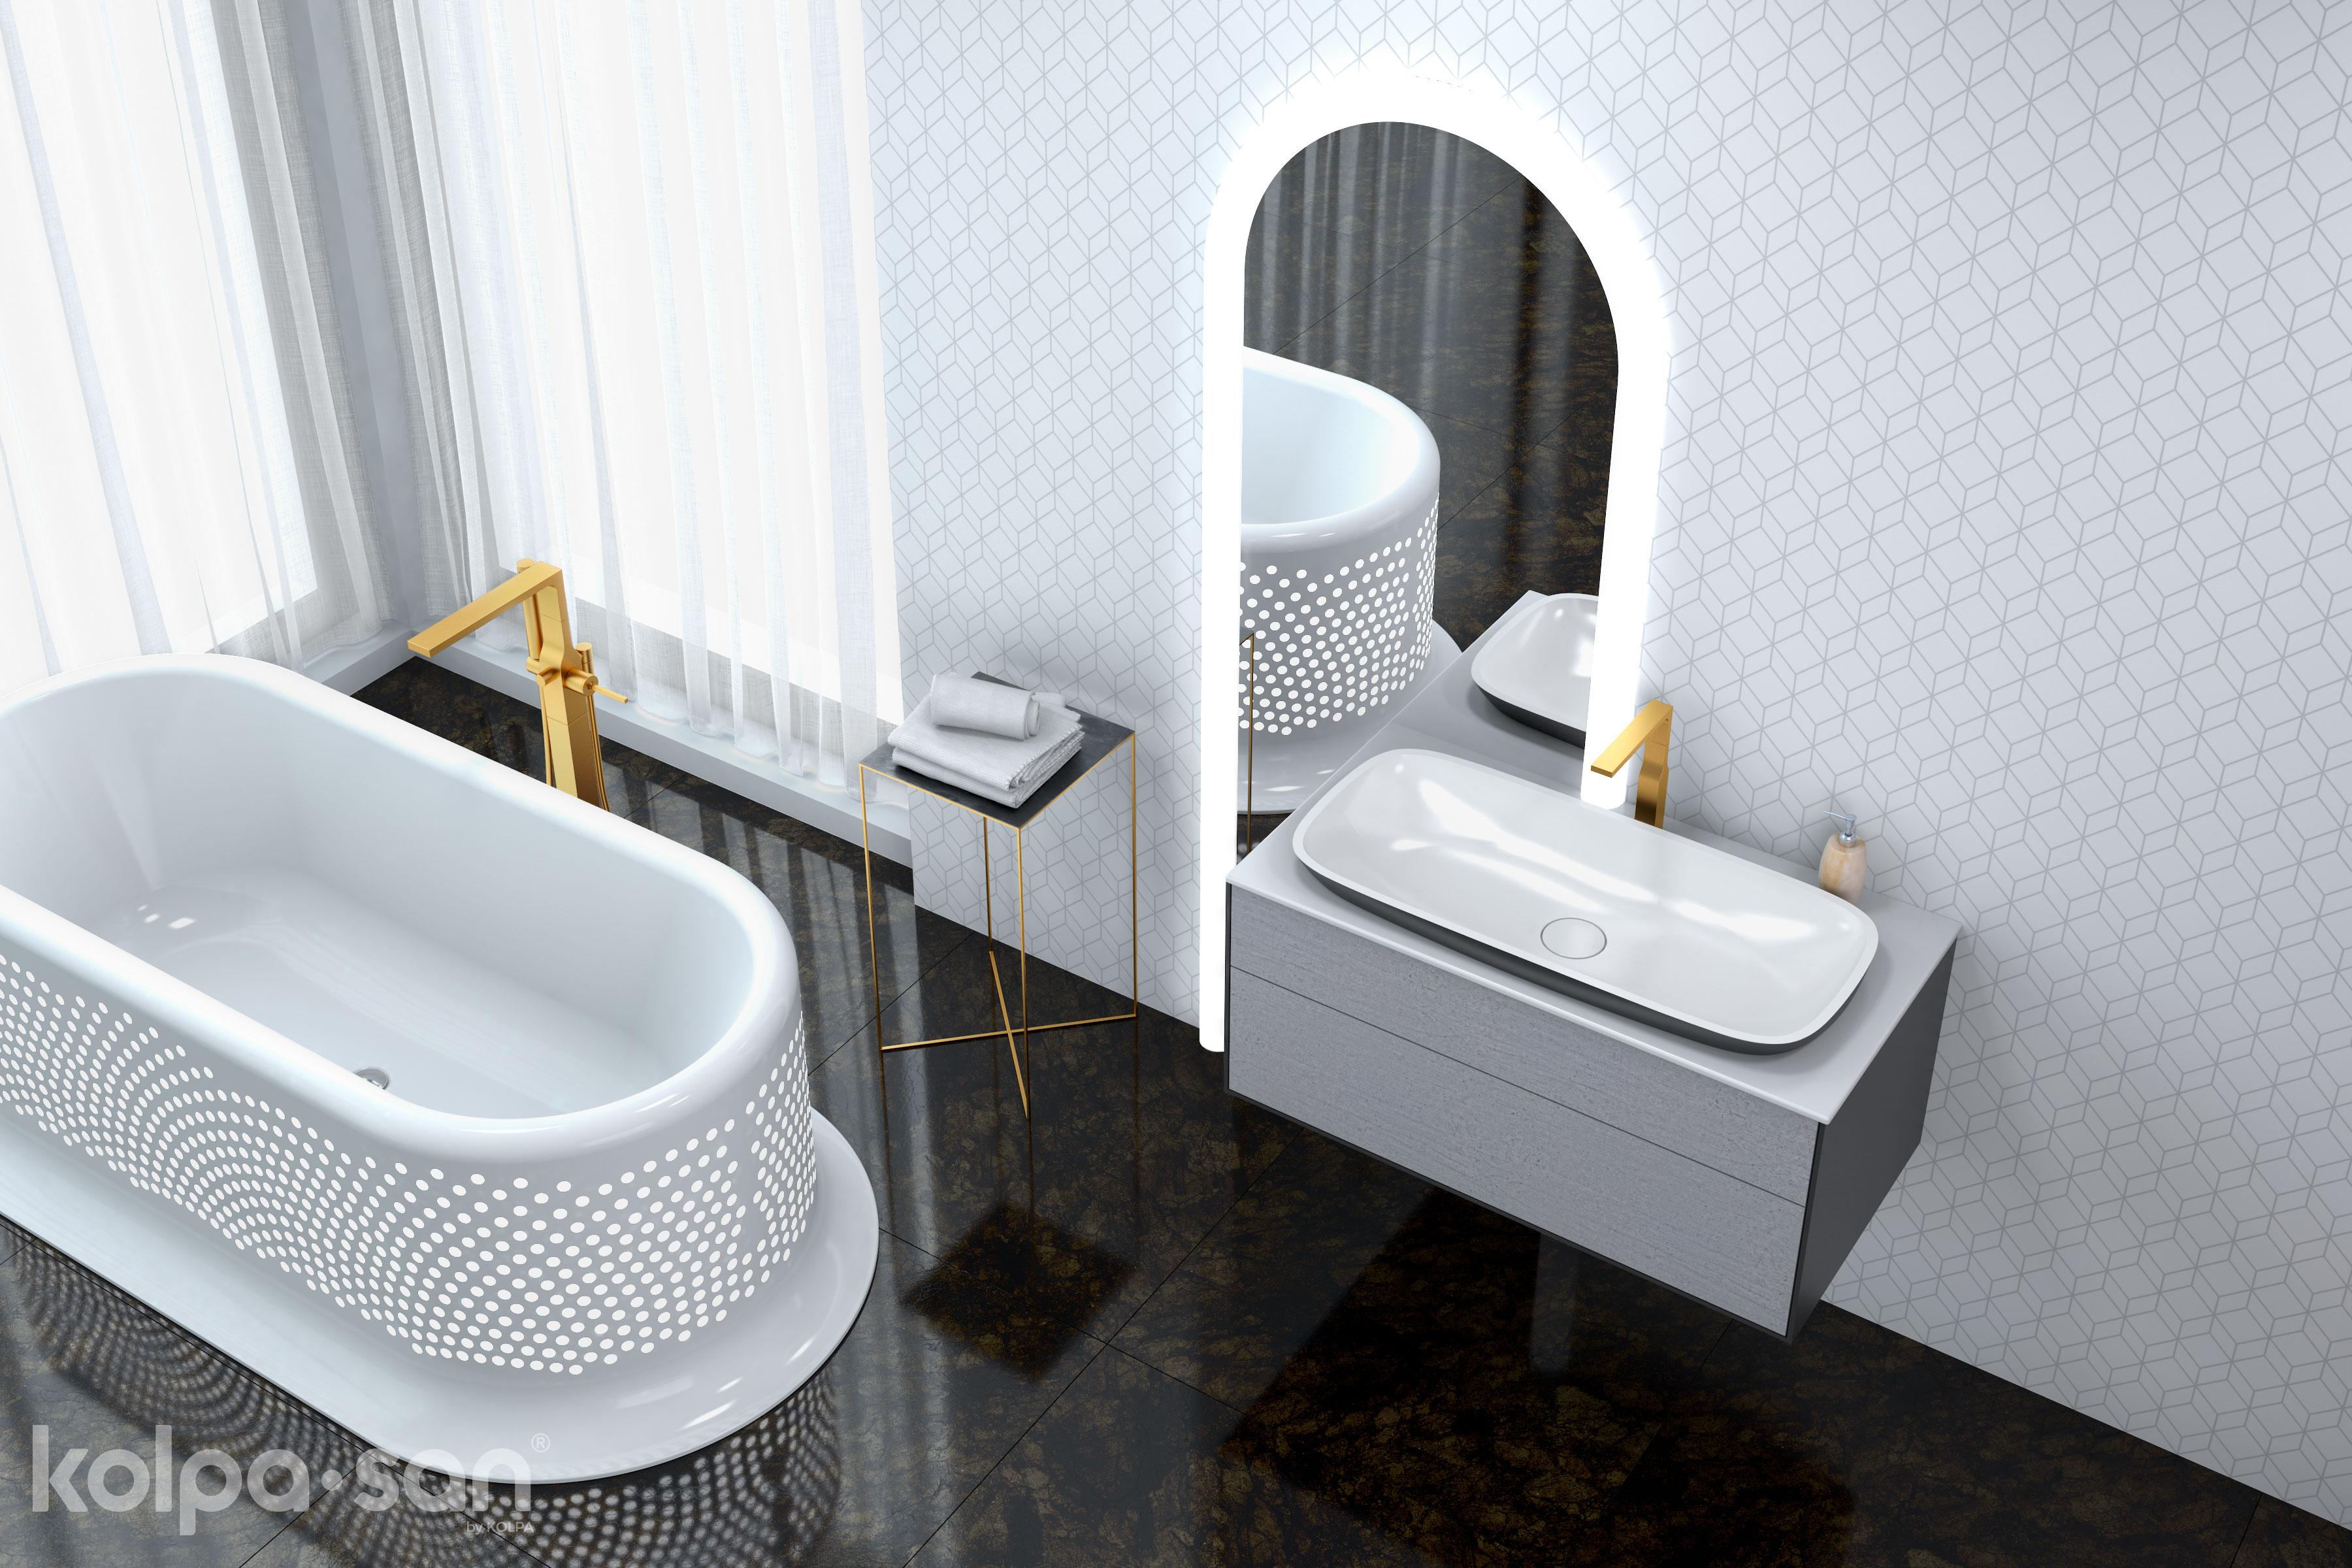 Kolpa-San skříňka s umyvadlem a zrcadlem do koupelny